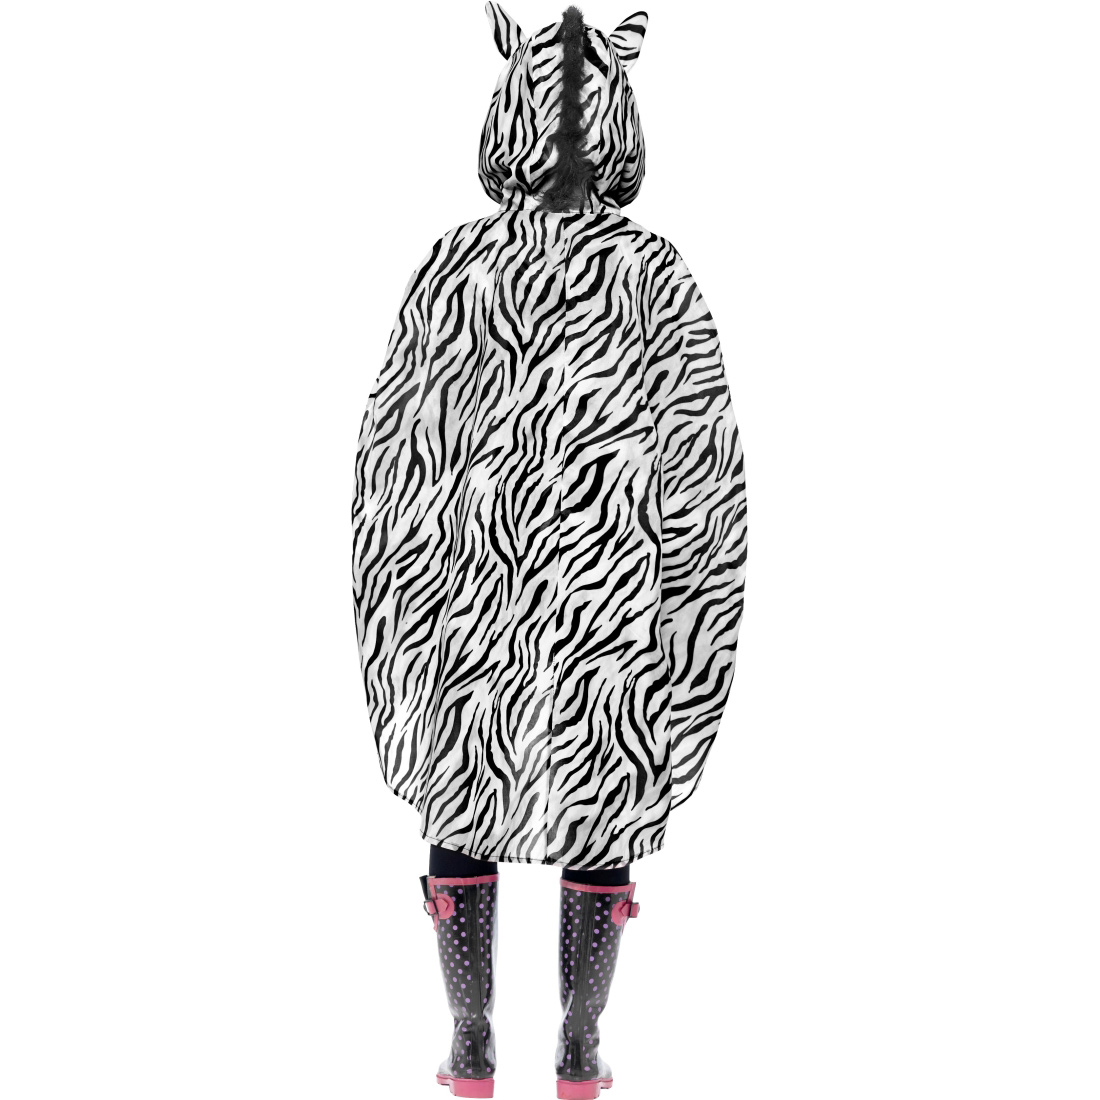 zebra party poncho partyponcho regenponcho cape regencape tierkost m umhang ebay. Black Bedroom Furniture Sets. Home Design Ideas